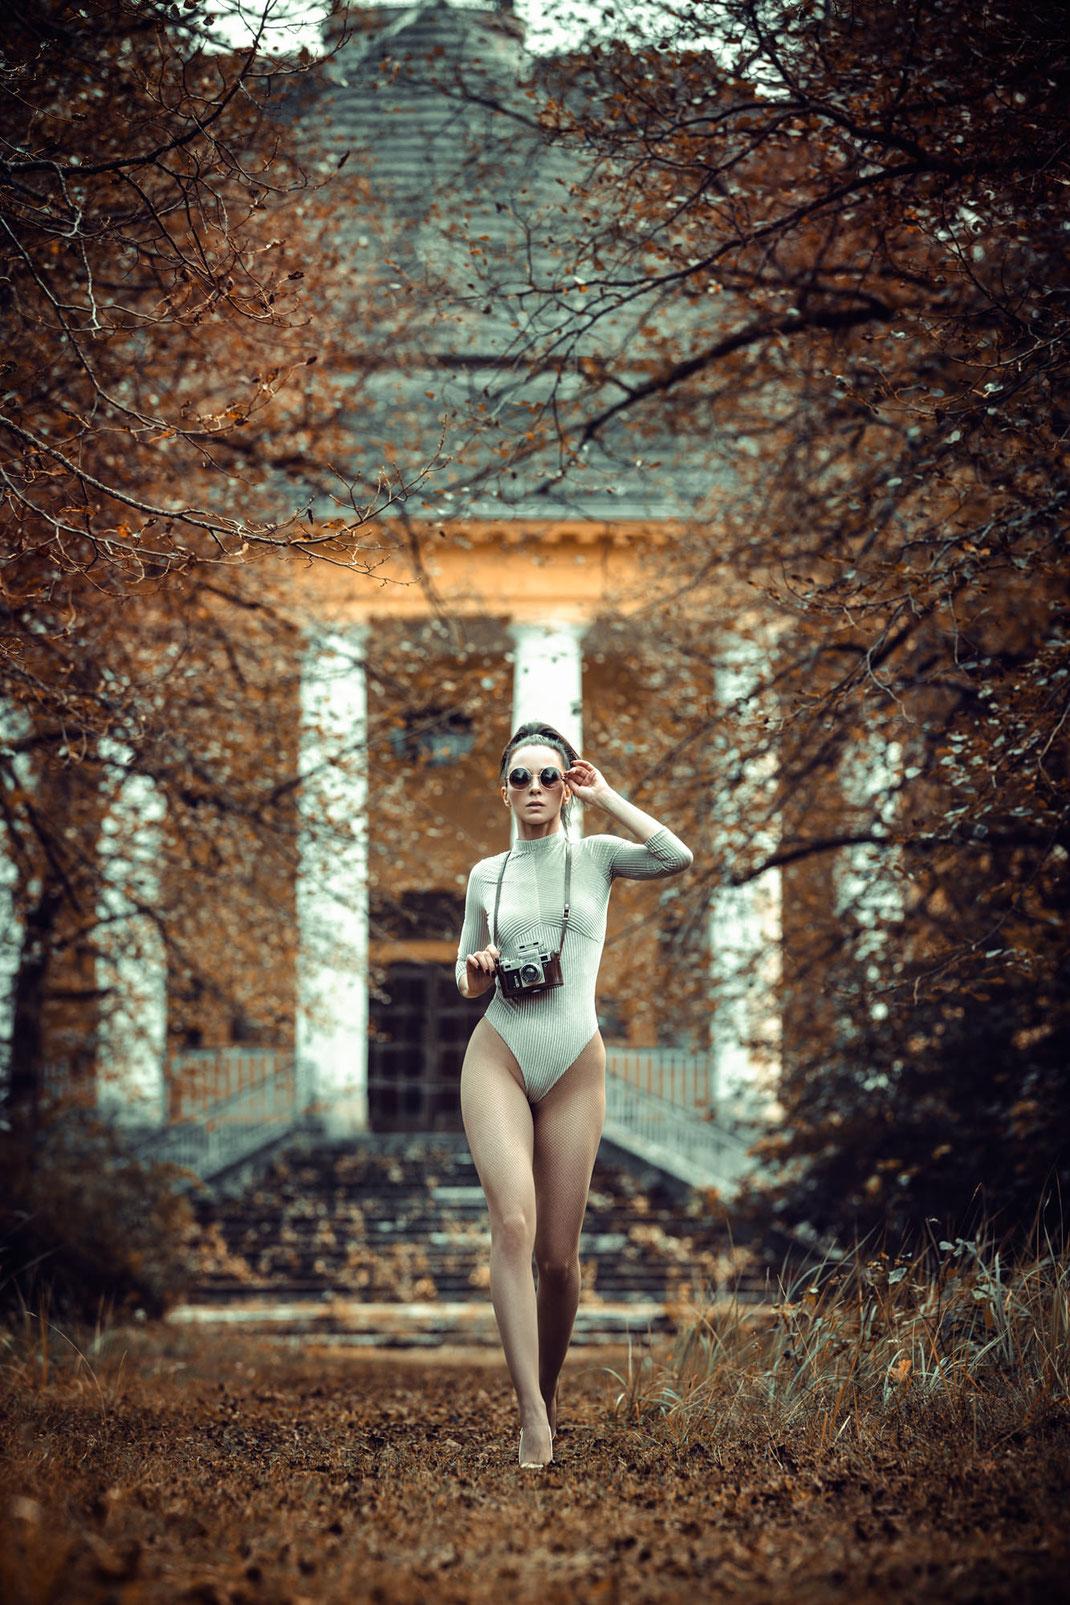 Two Beauties - Angélique & Kiev IV Contax Clone